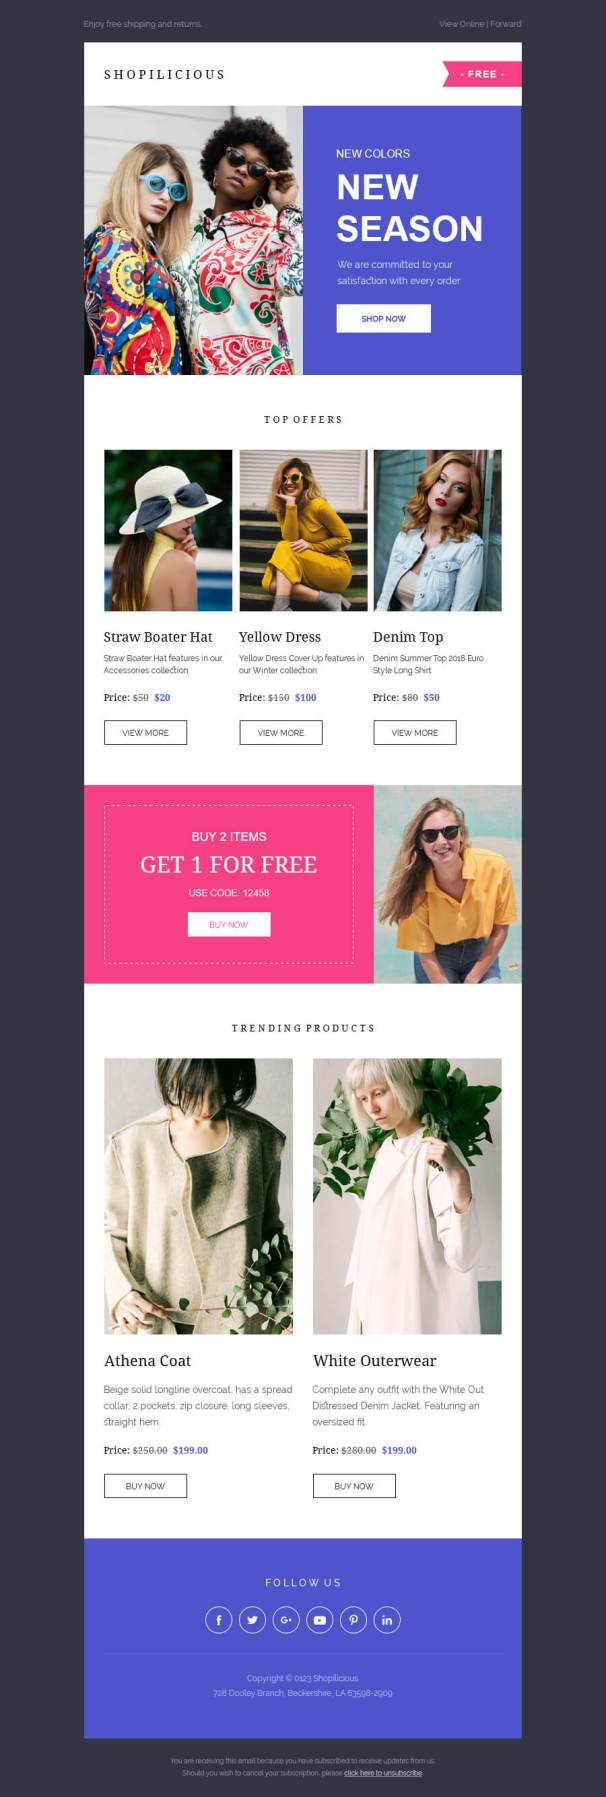 Shopilicious_E-commerce_Free-1